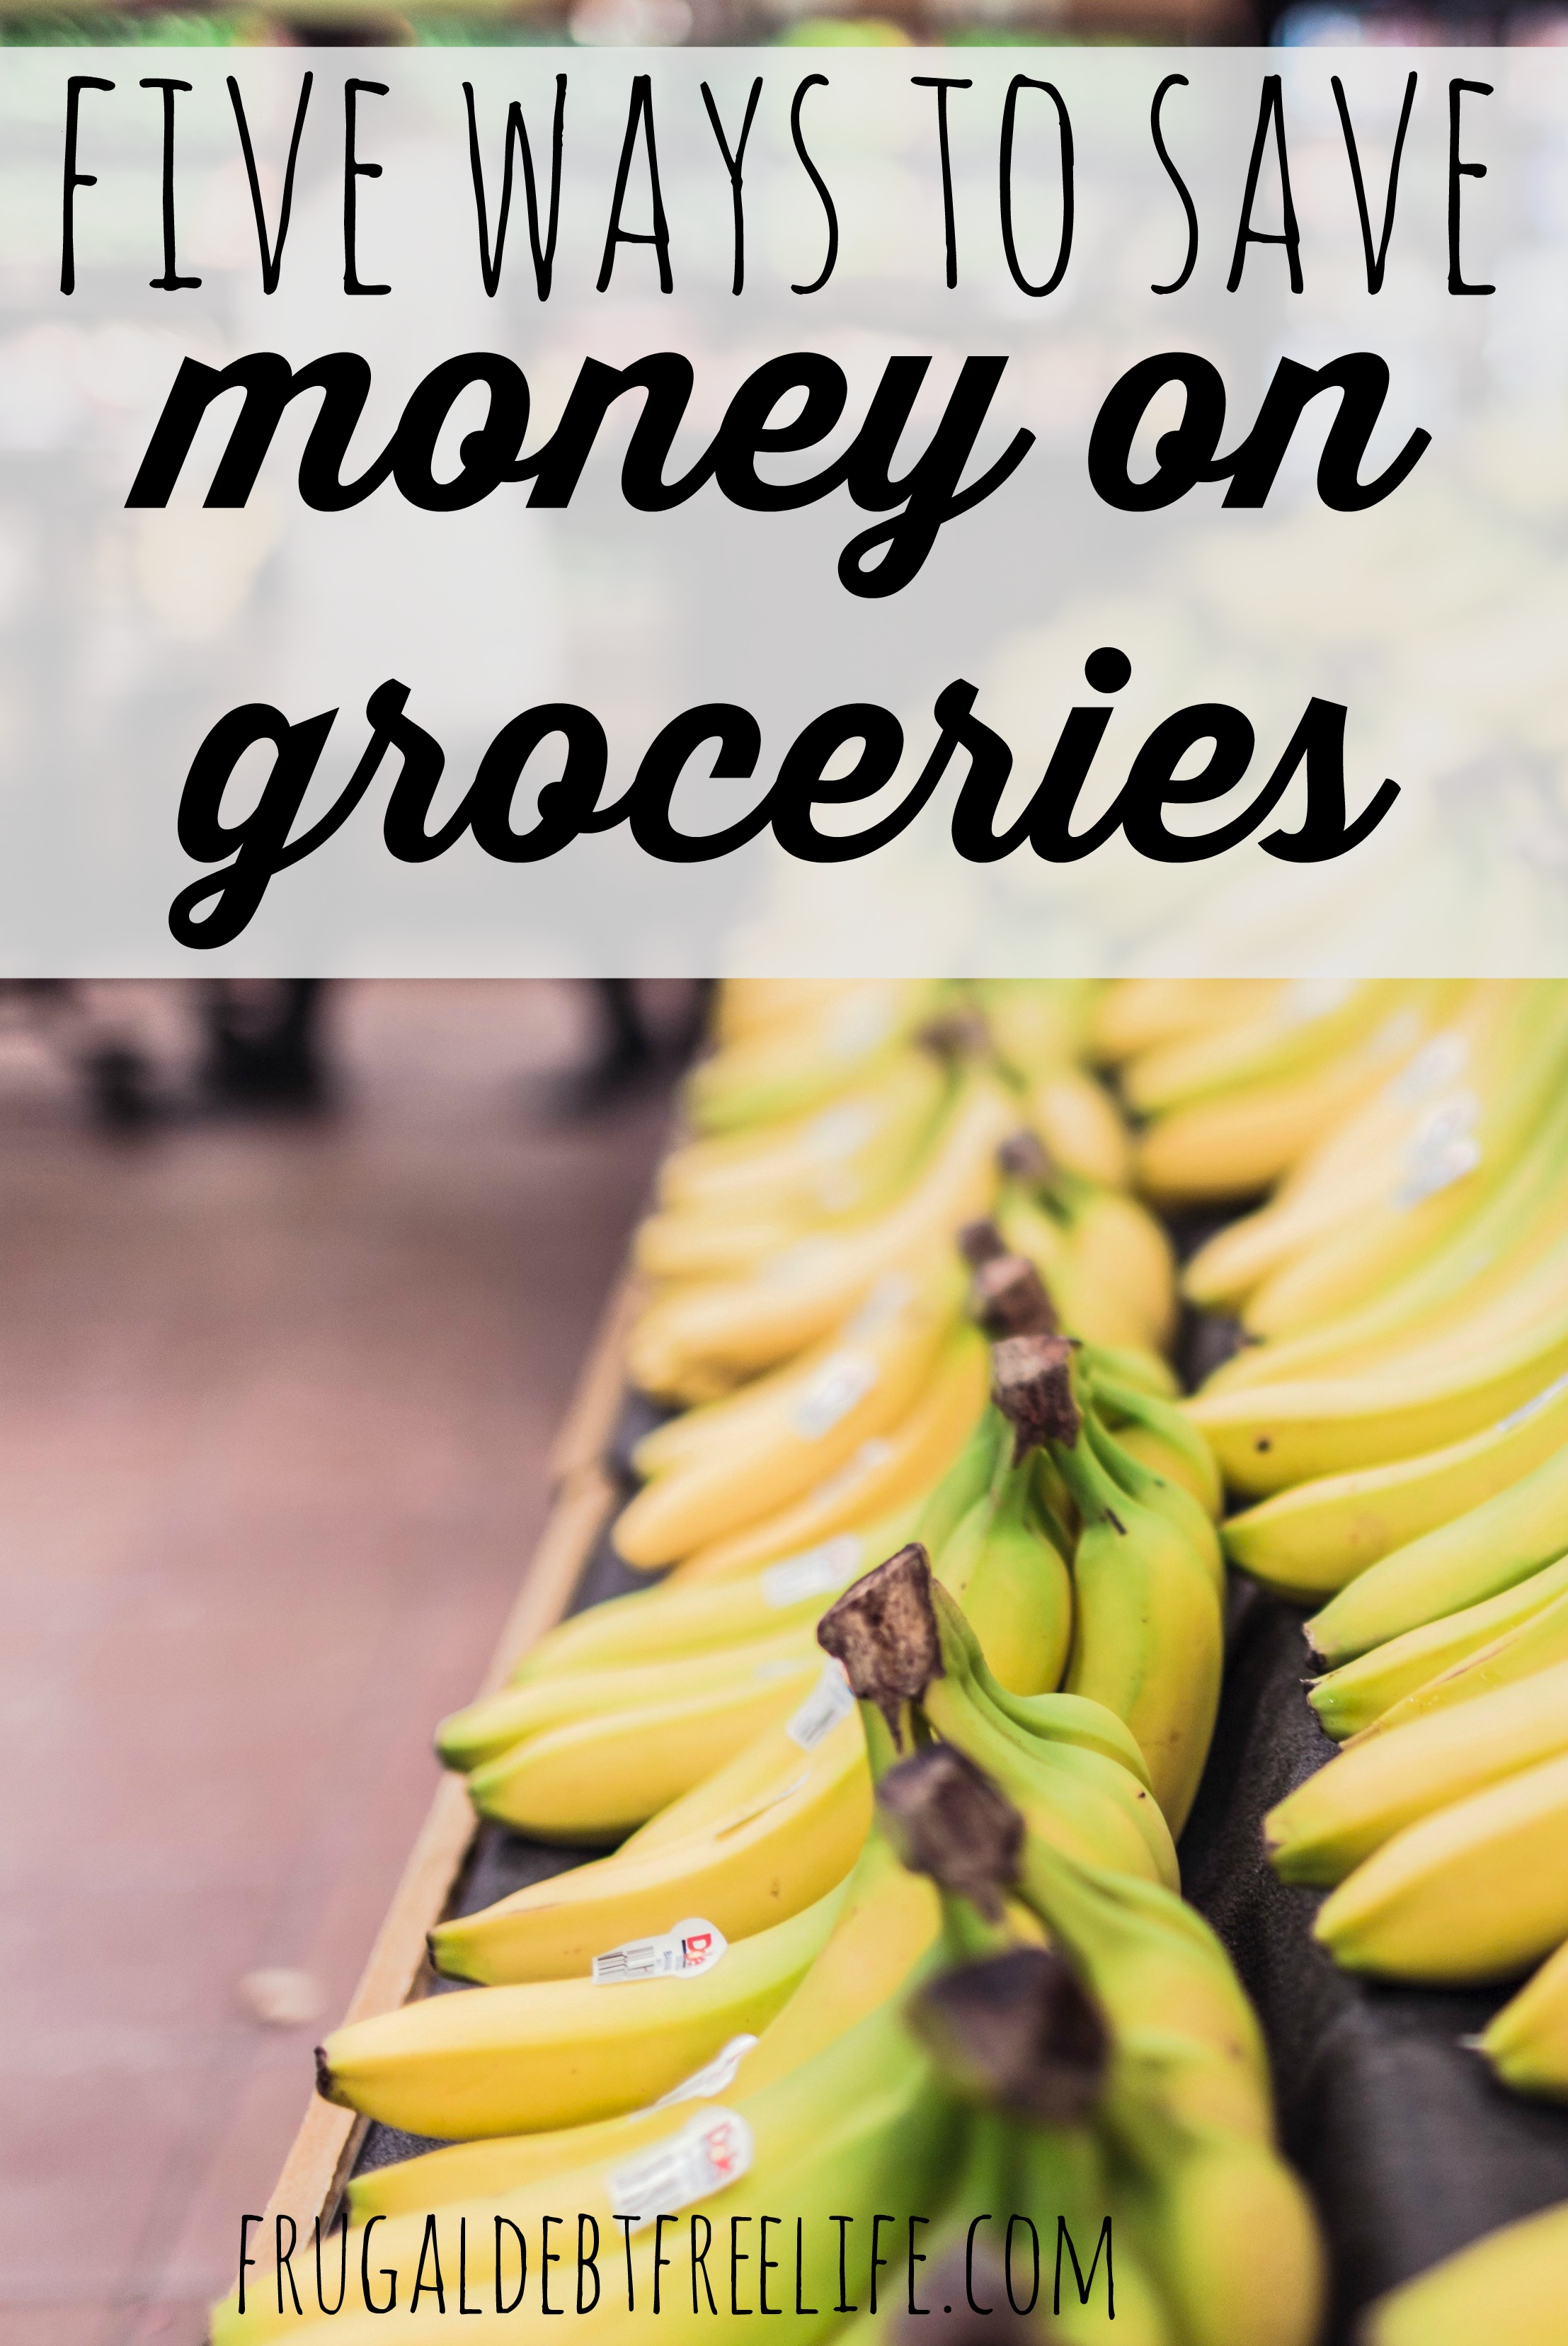 five ways to save money on groceries.jpg